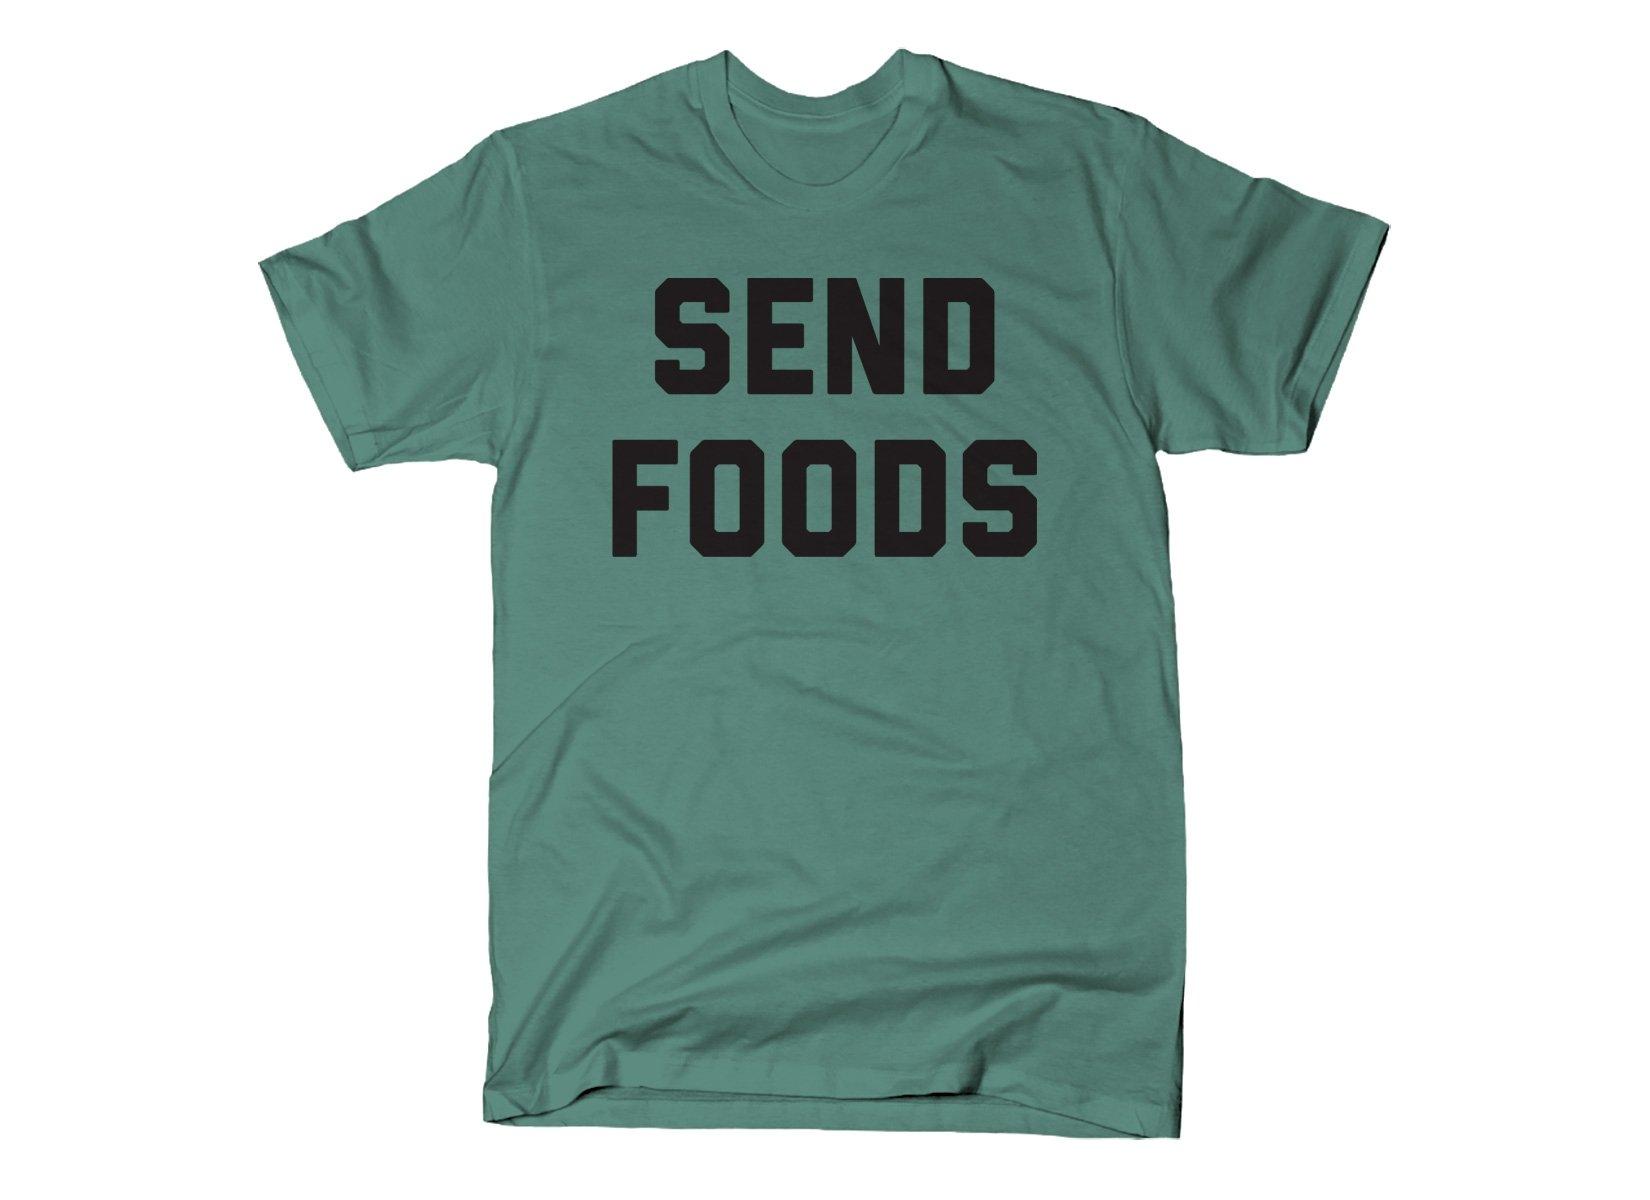 Send Foods on Mens T-Shirt